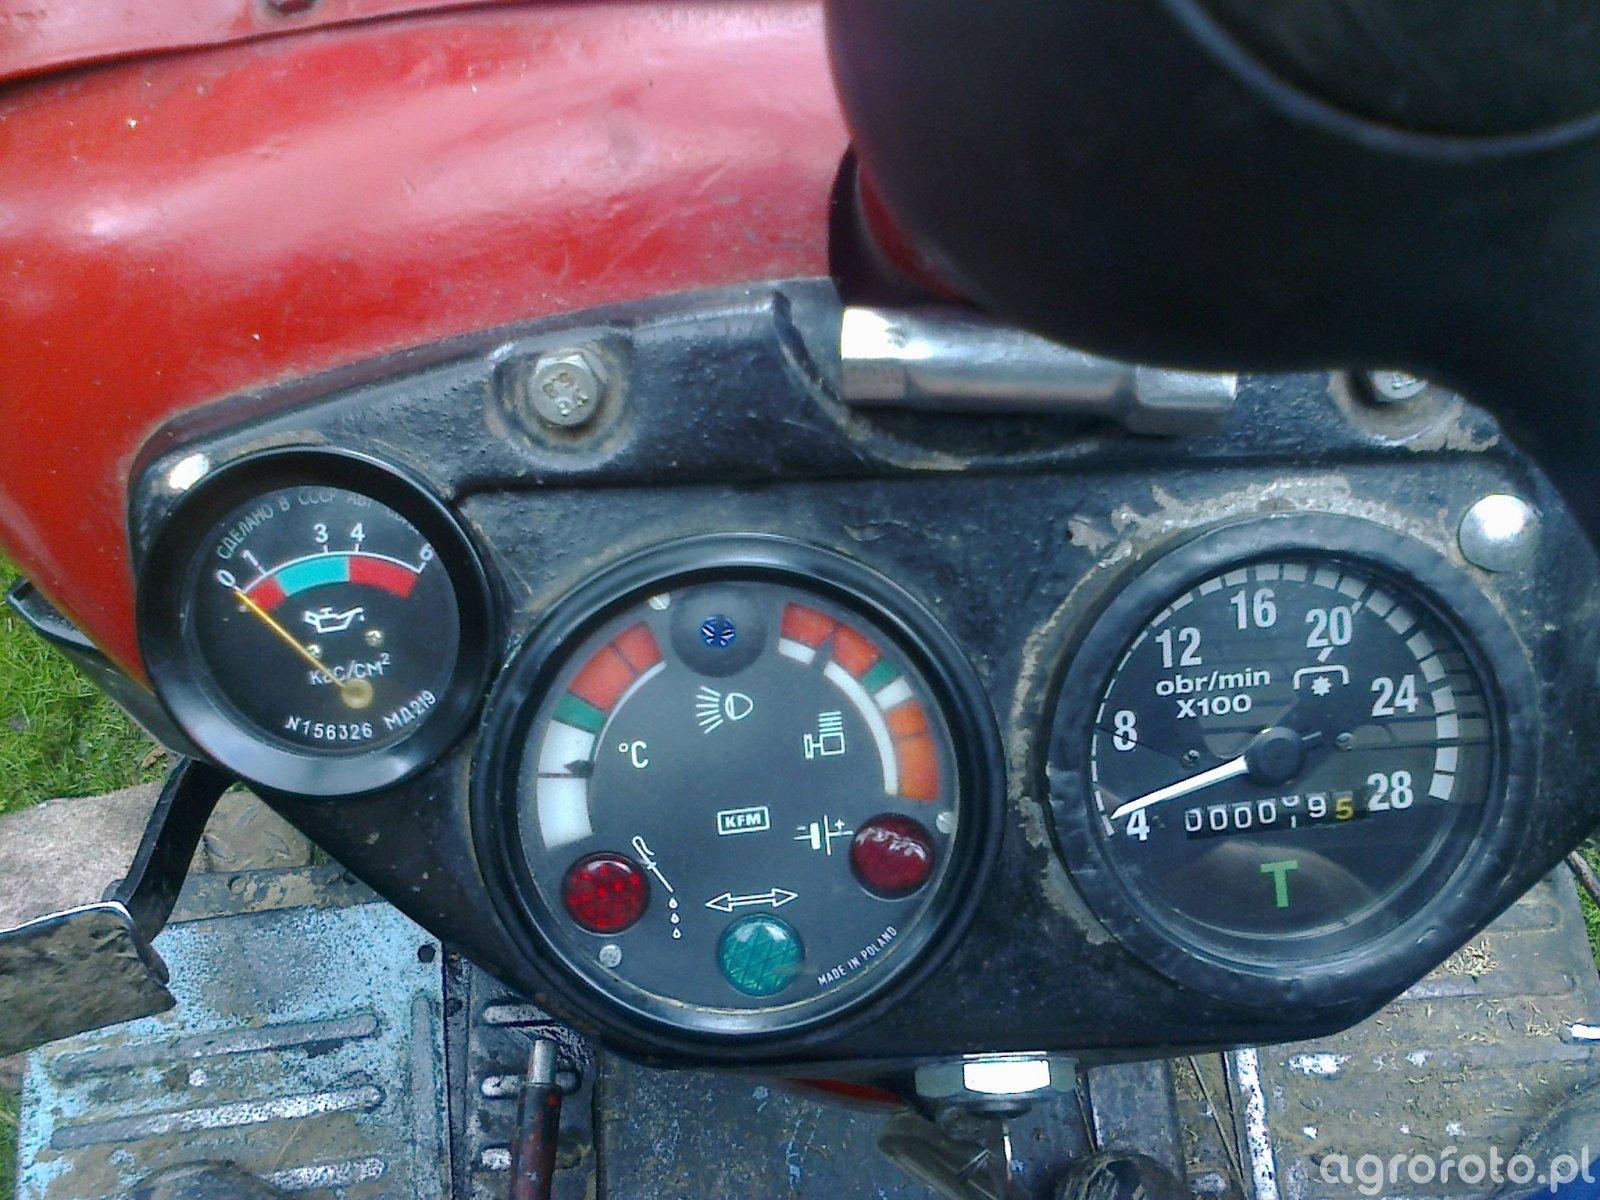 Zegar ciśnienia oleju w Ursusie C-360